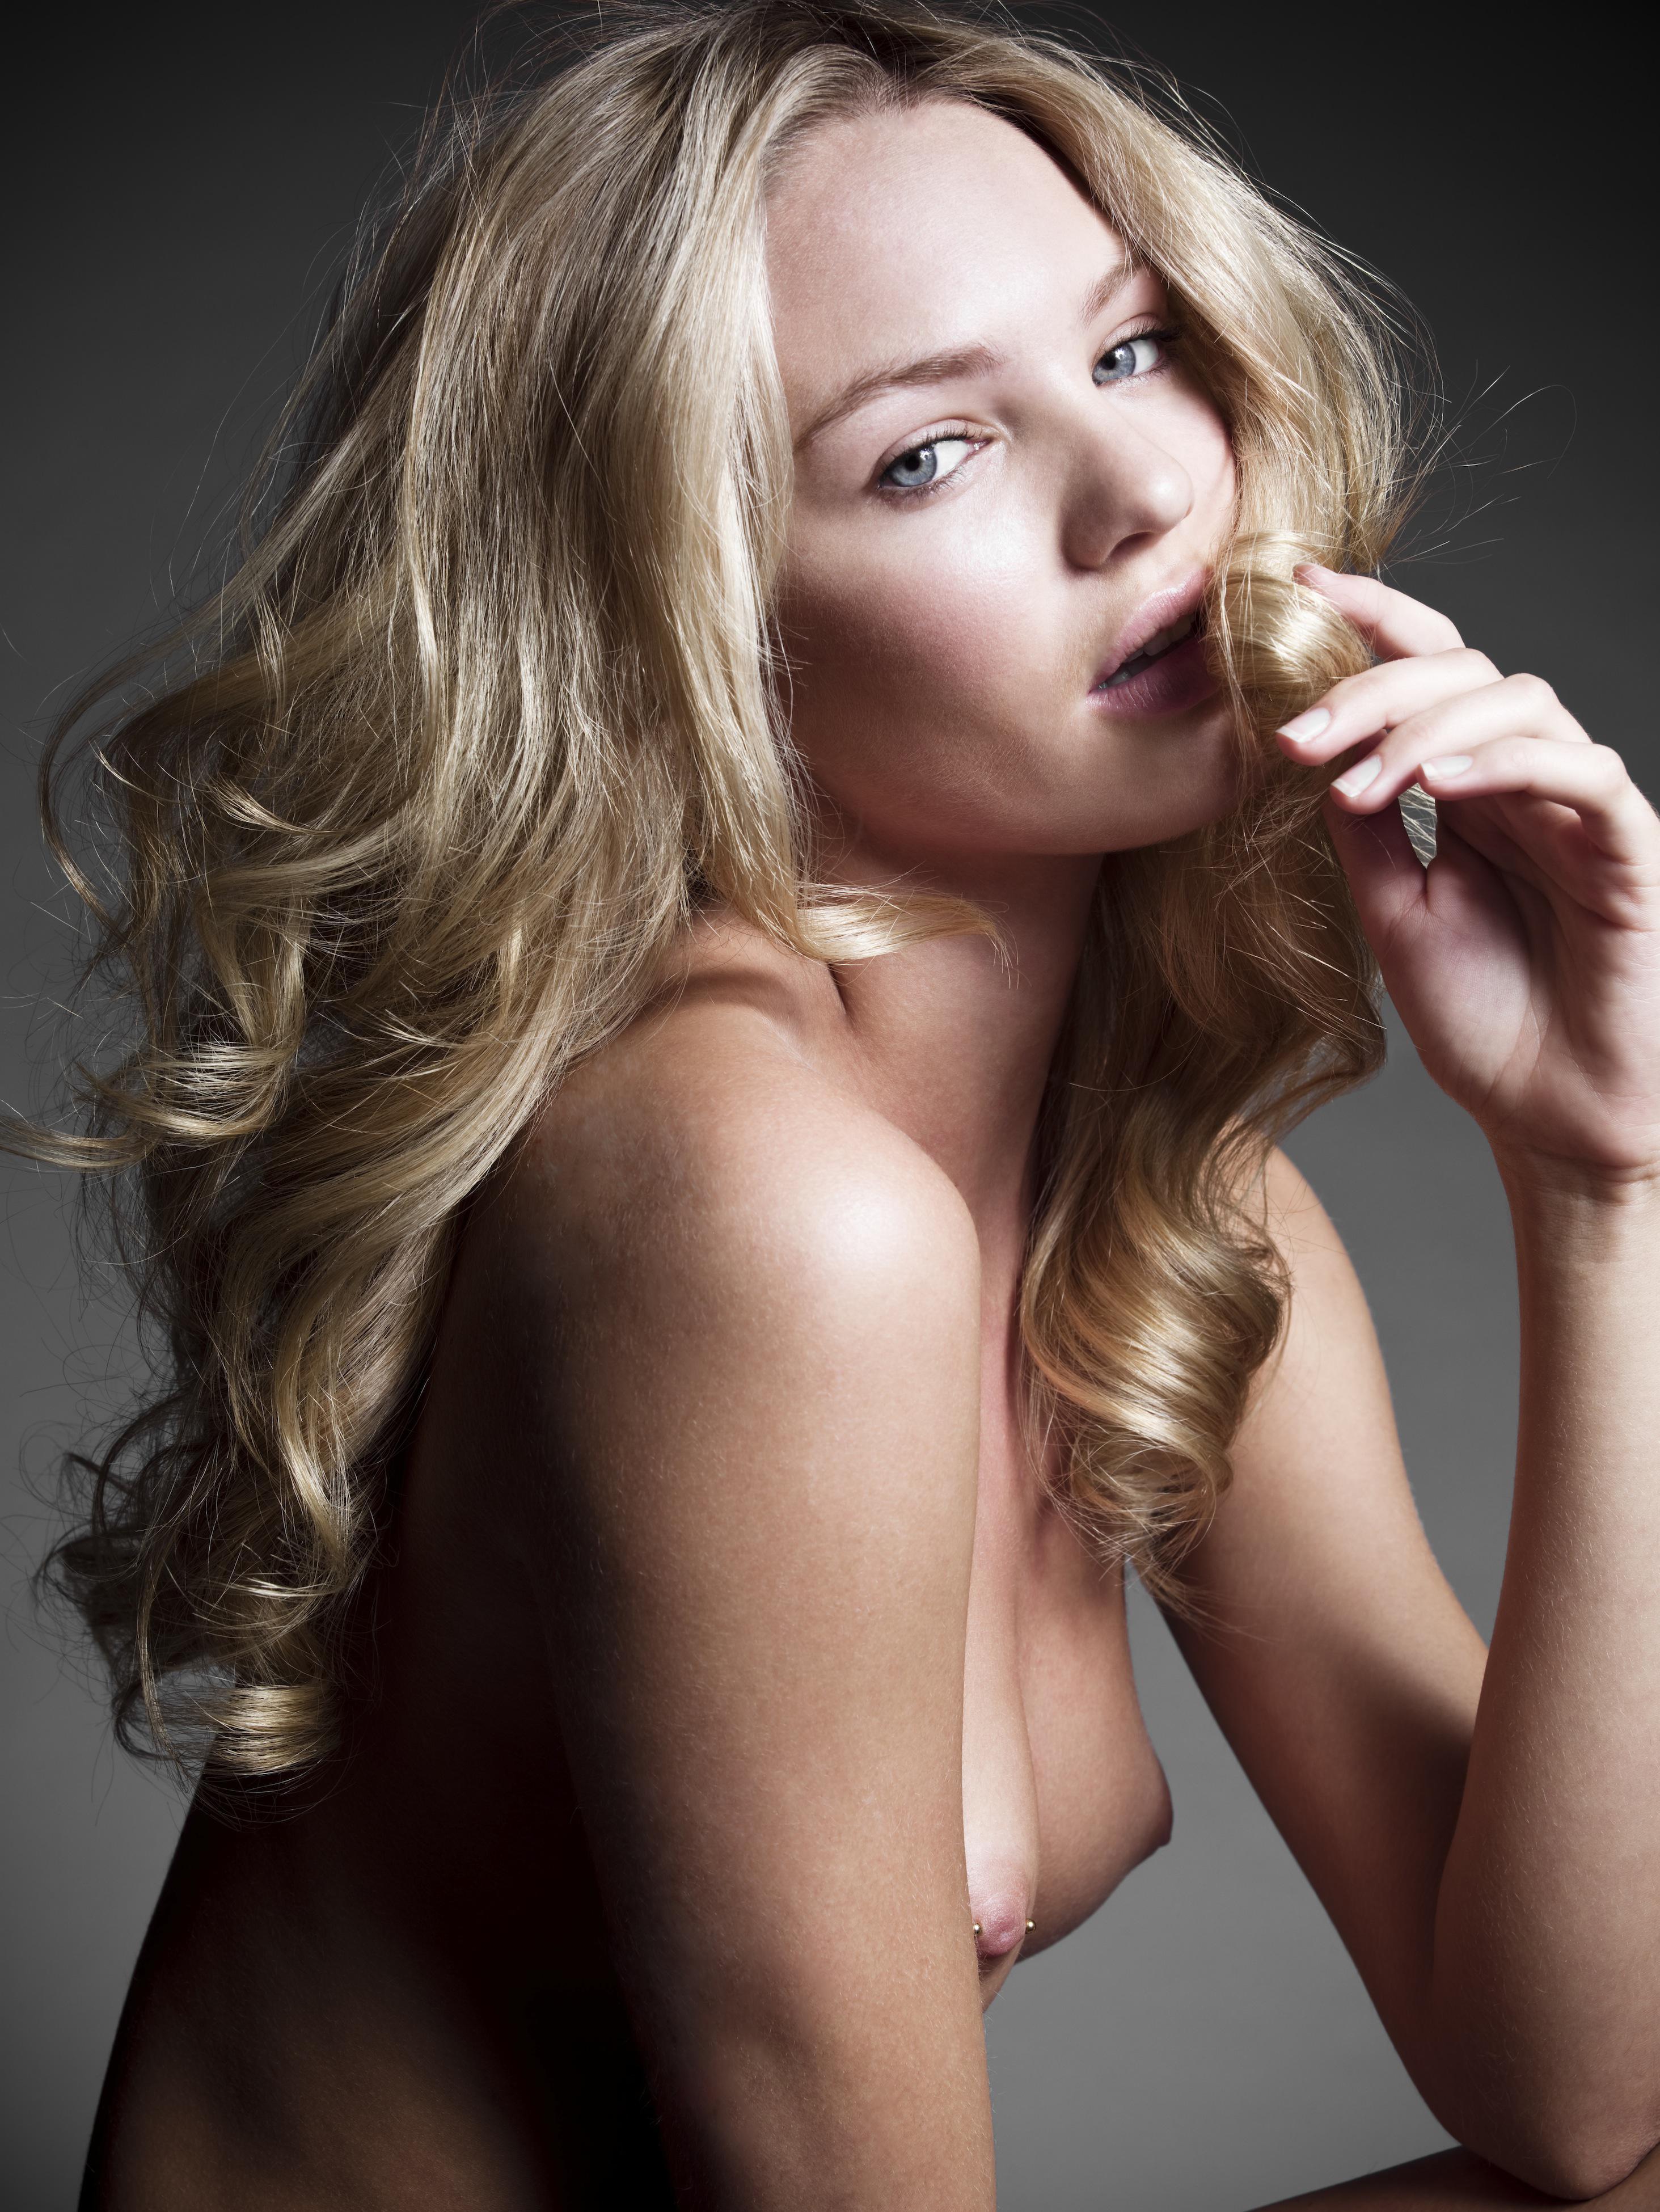 Candice Swanepoe fotos desnudas